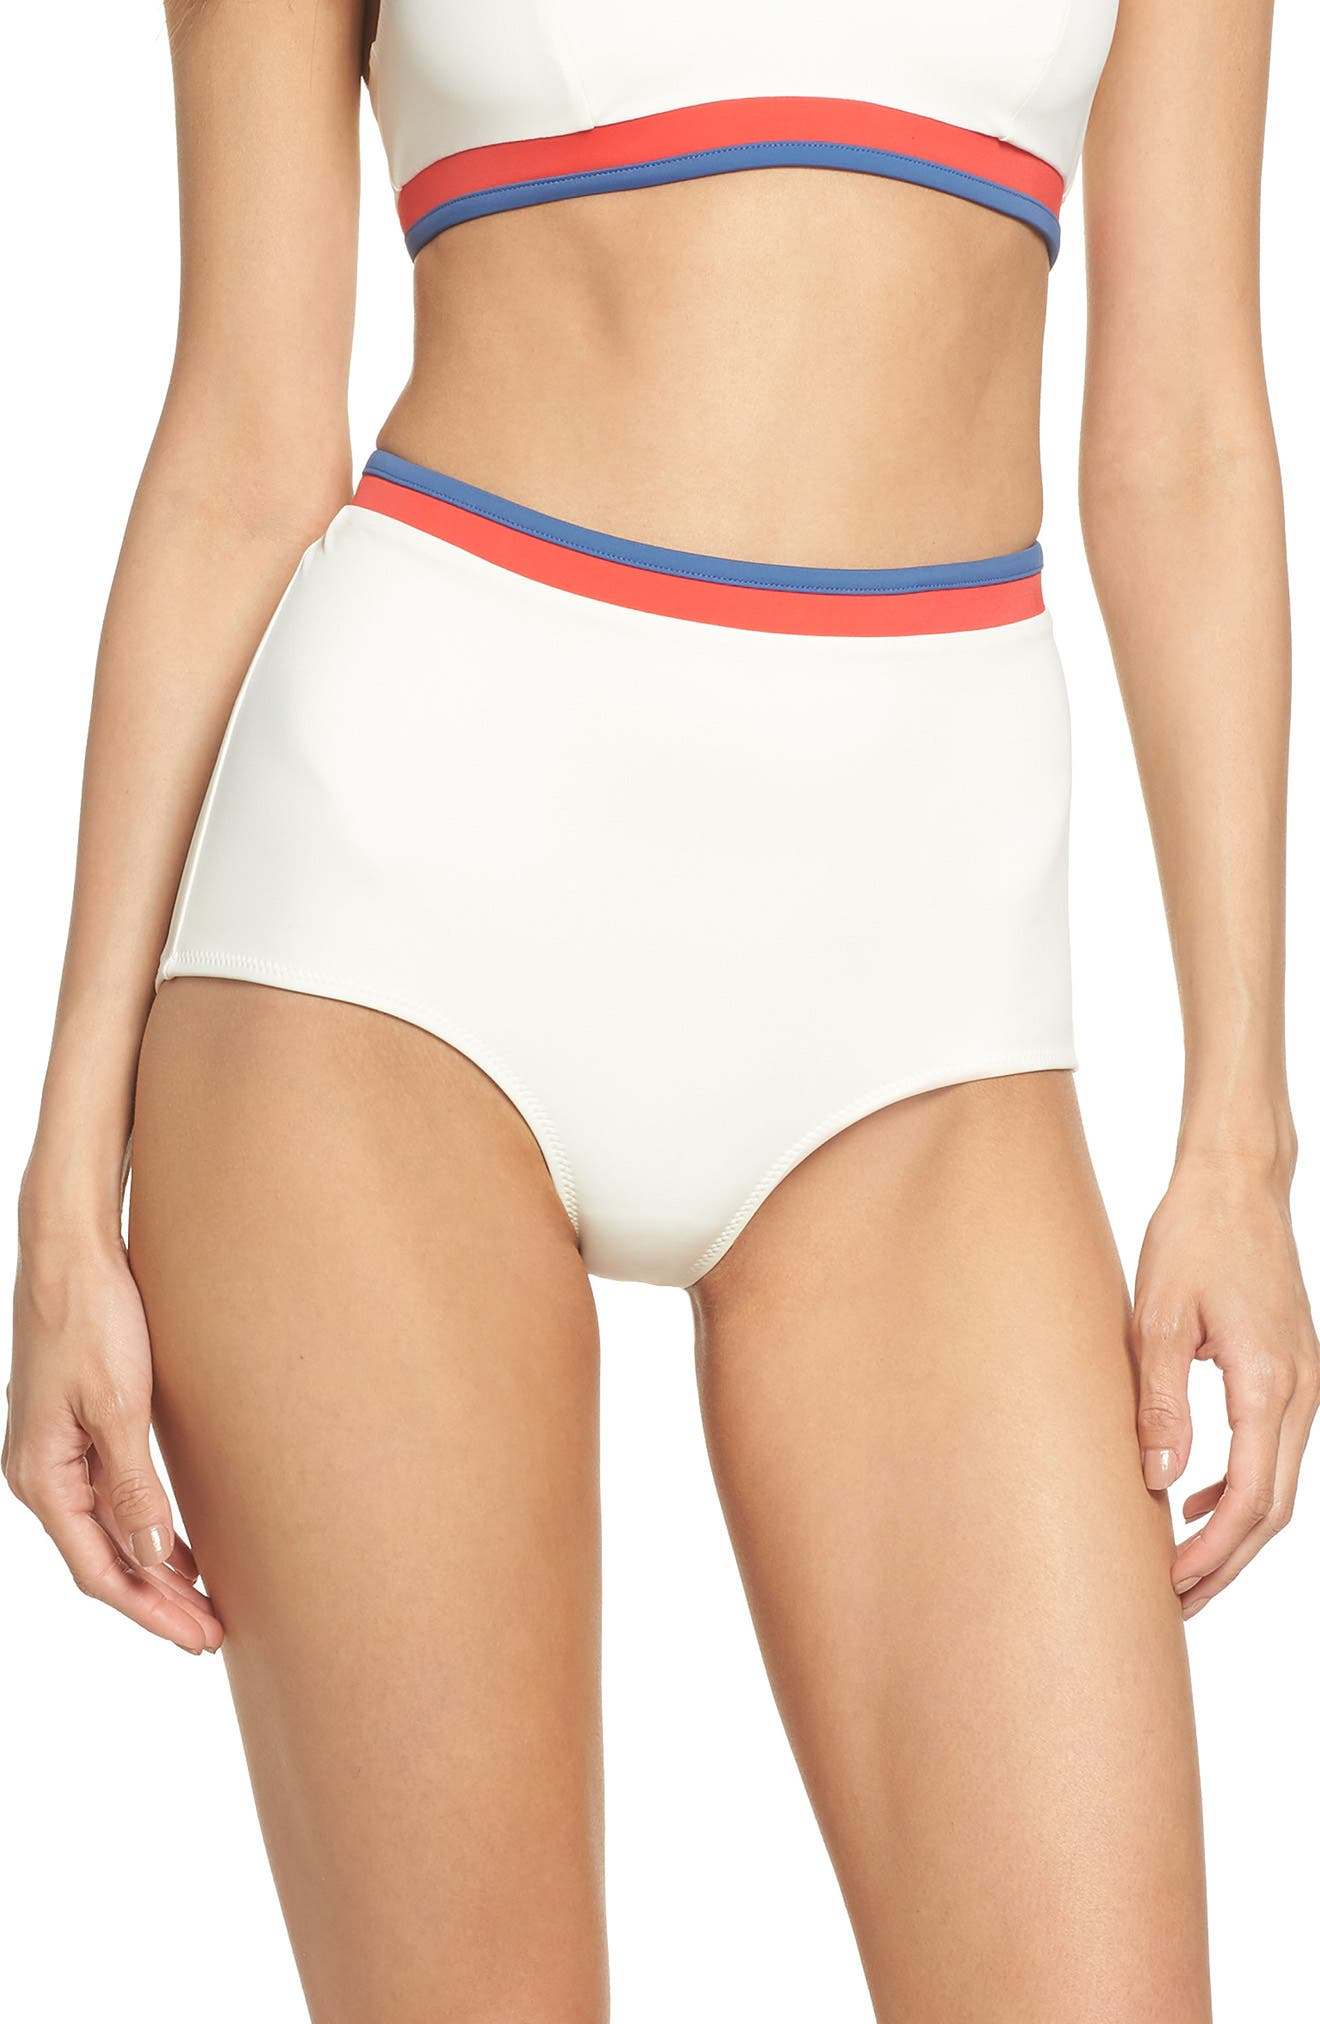 Solid & Stripe Katie High Waist Bikini Bottoms,                         Main,                         color, 900